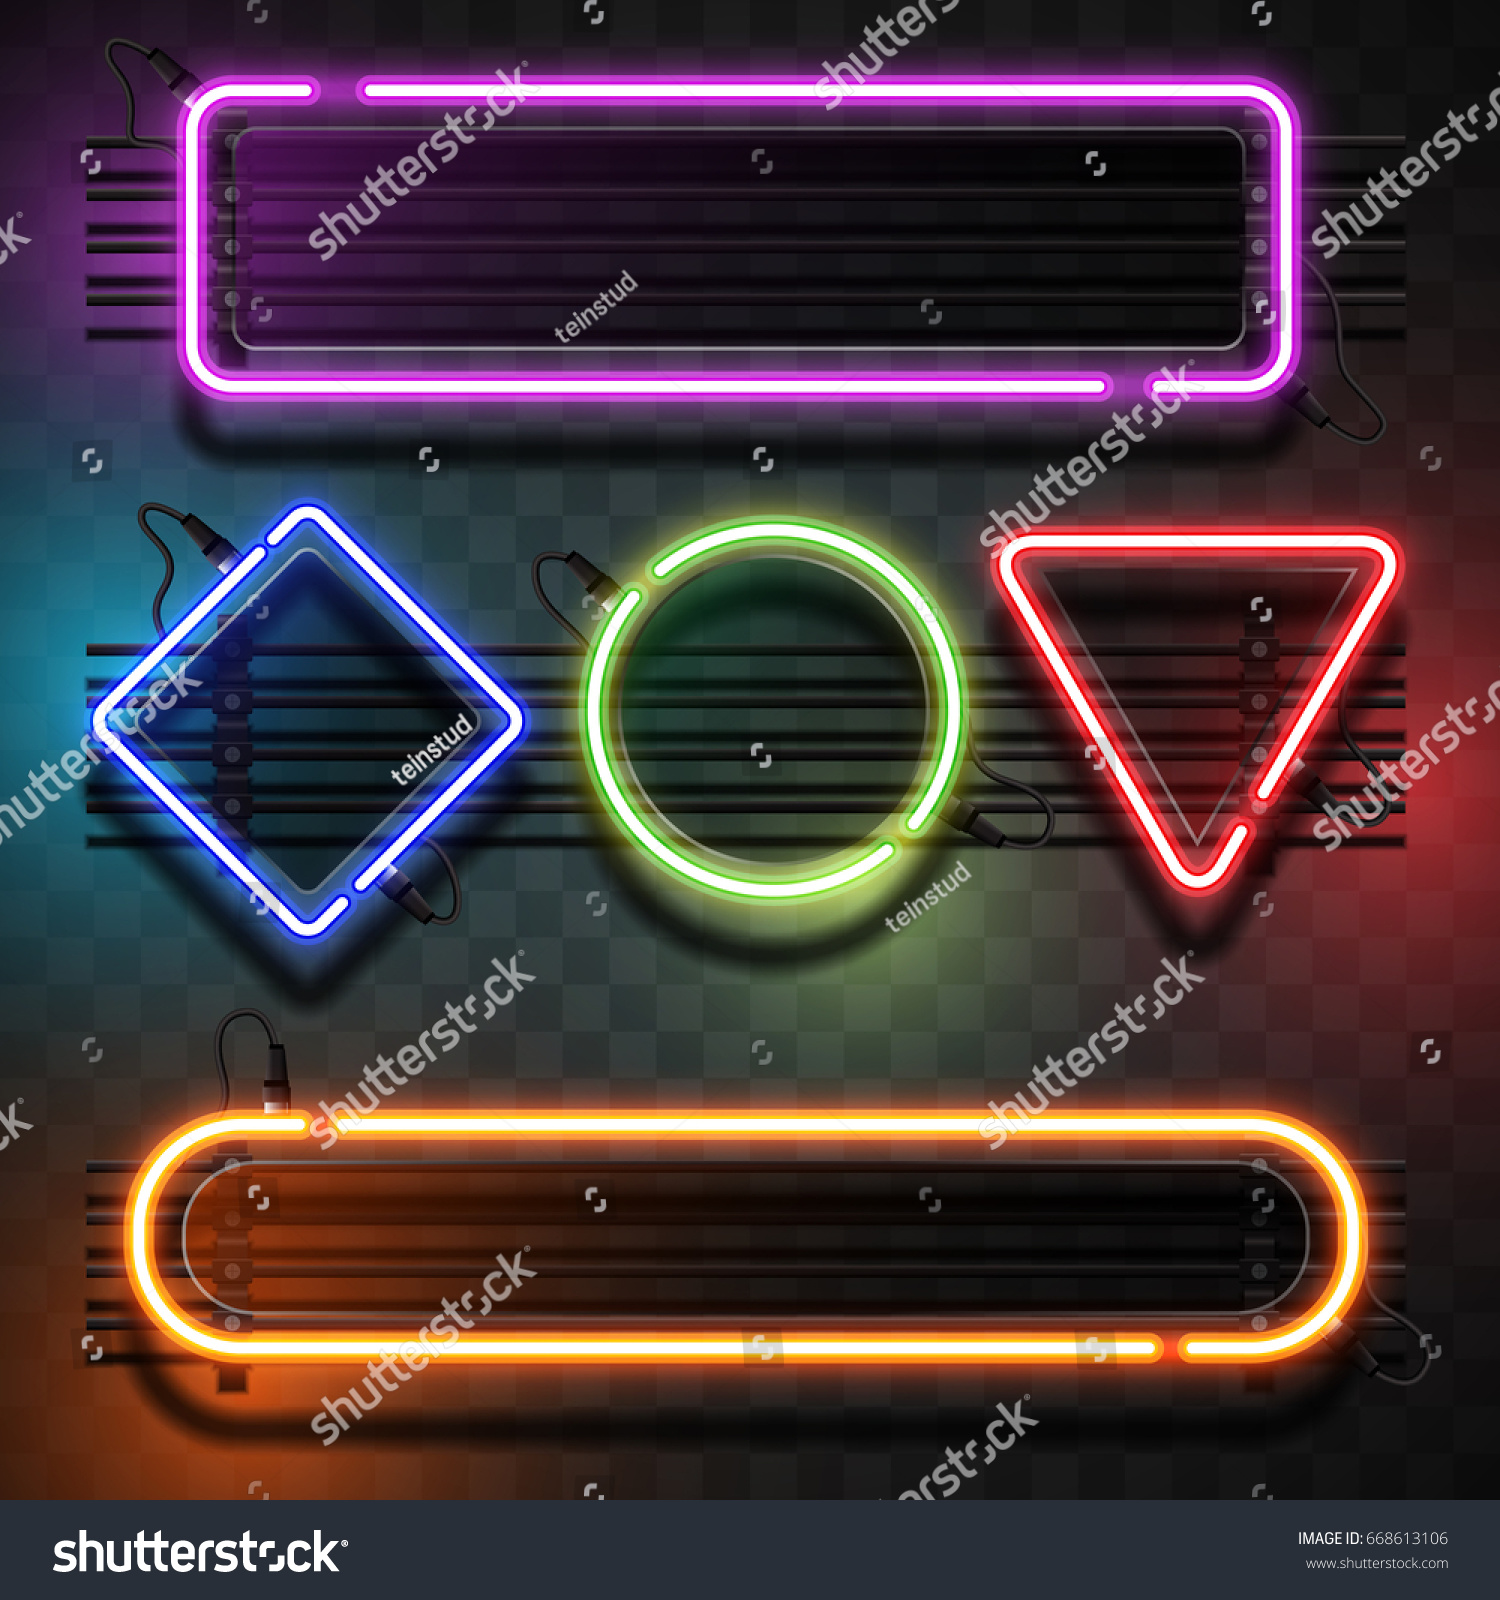 neon light template のベクター画像素材 ロイヤリティフリー